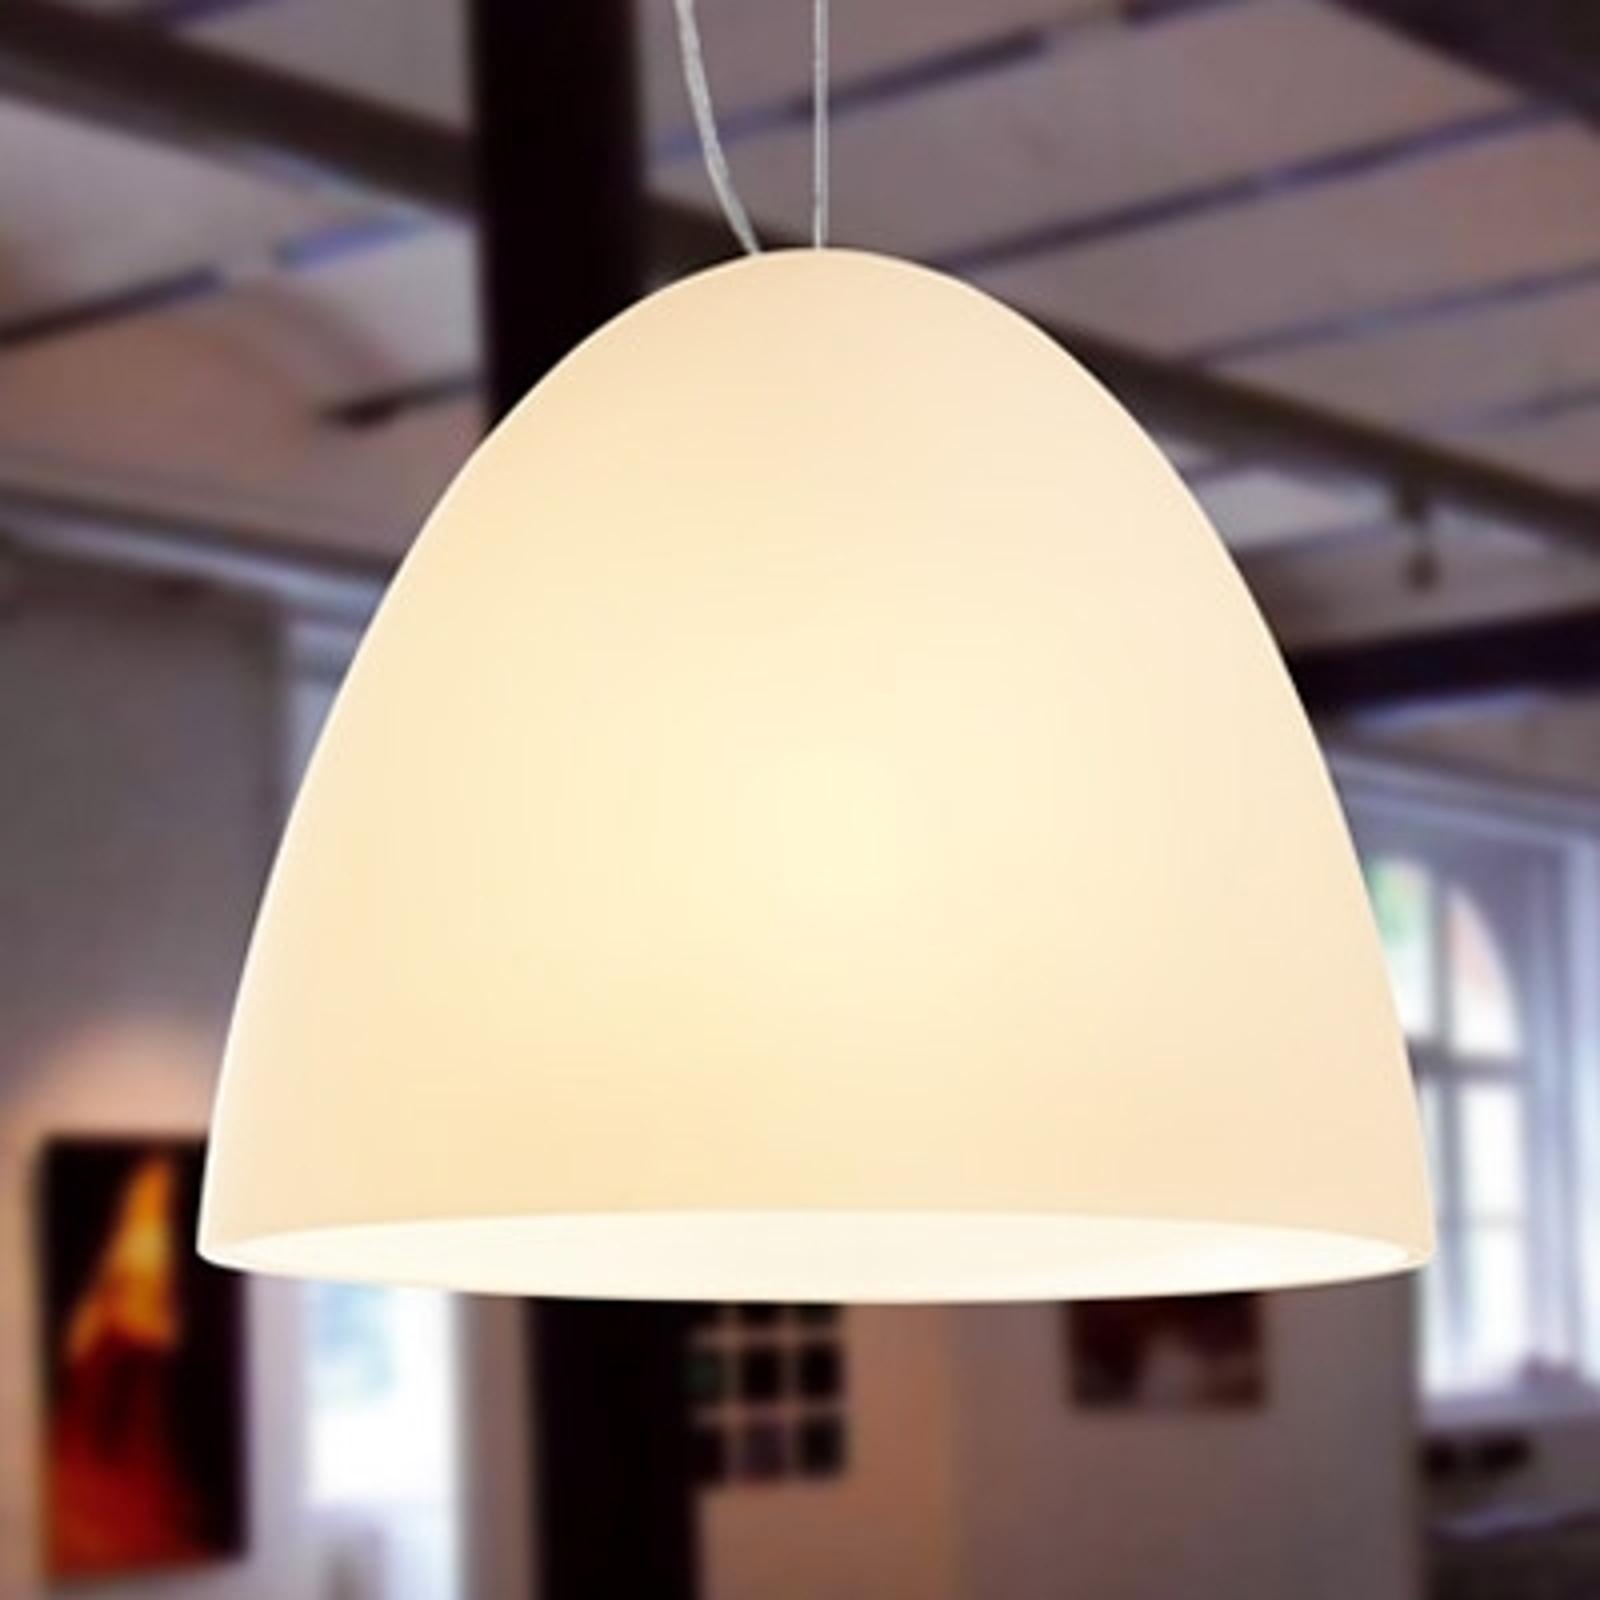 BELL - lampada a sospensione 1 lampadina 21 cm